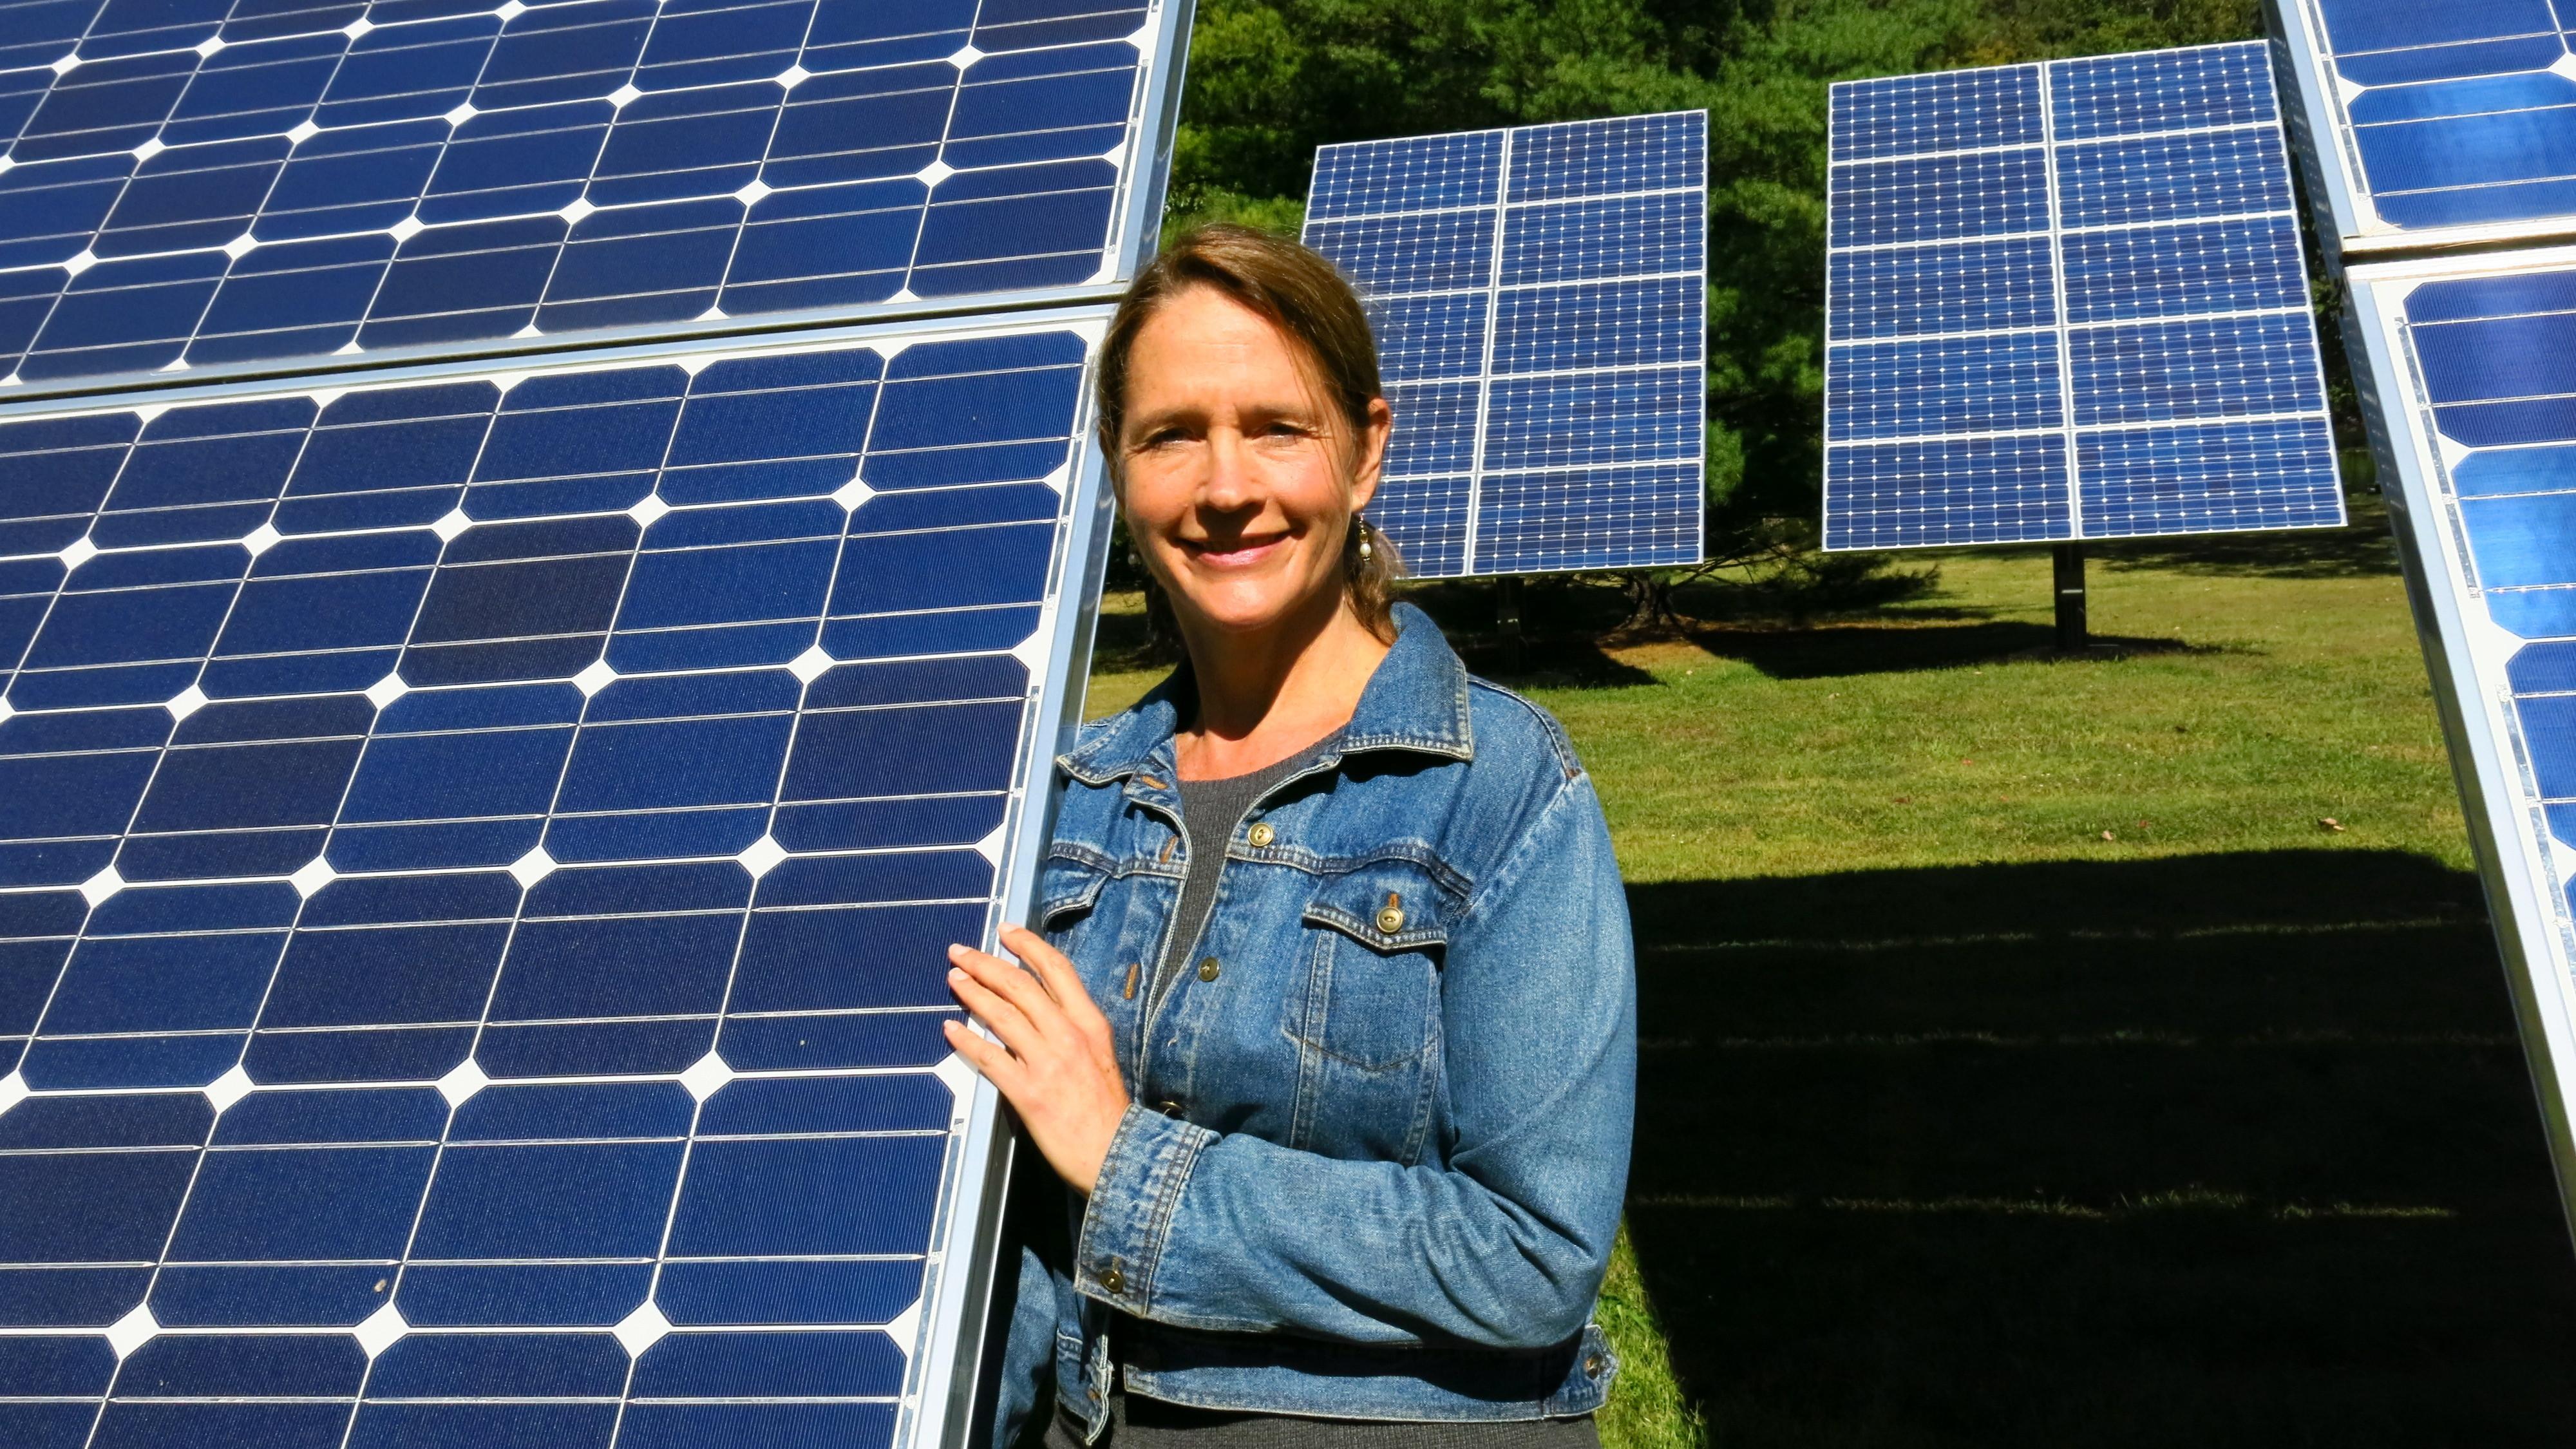 Solar Advocates Fight Utilities Over Grid Access